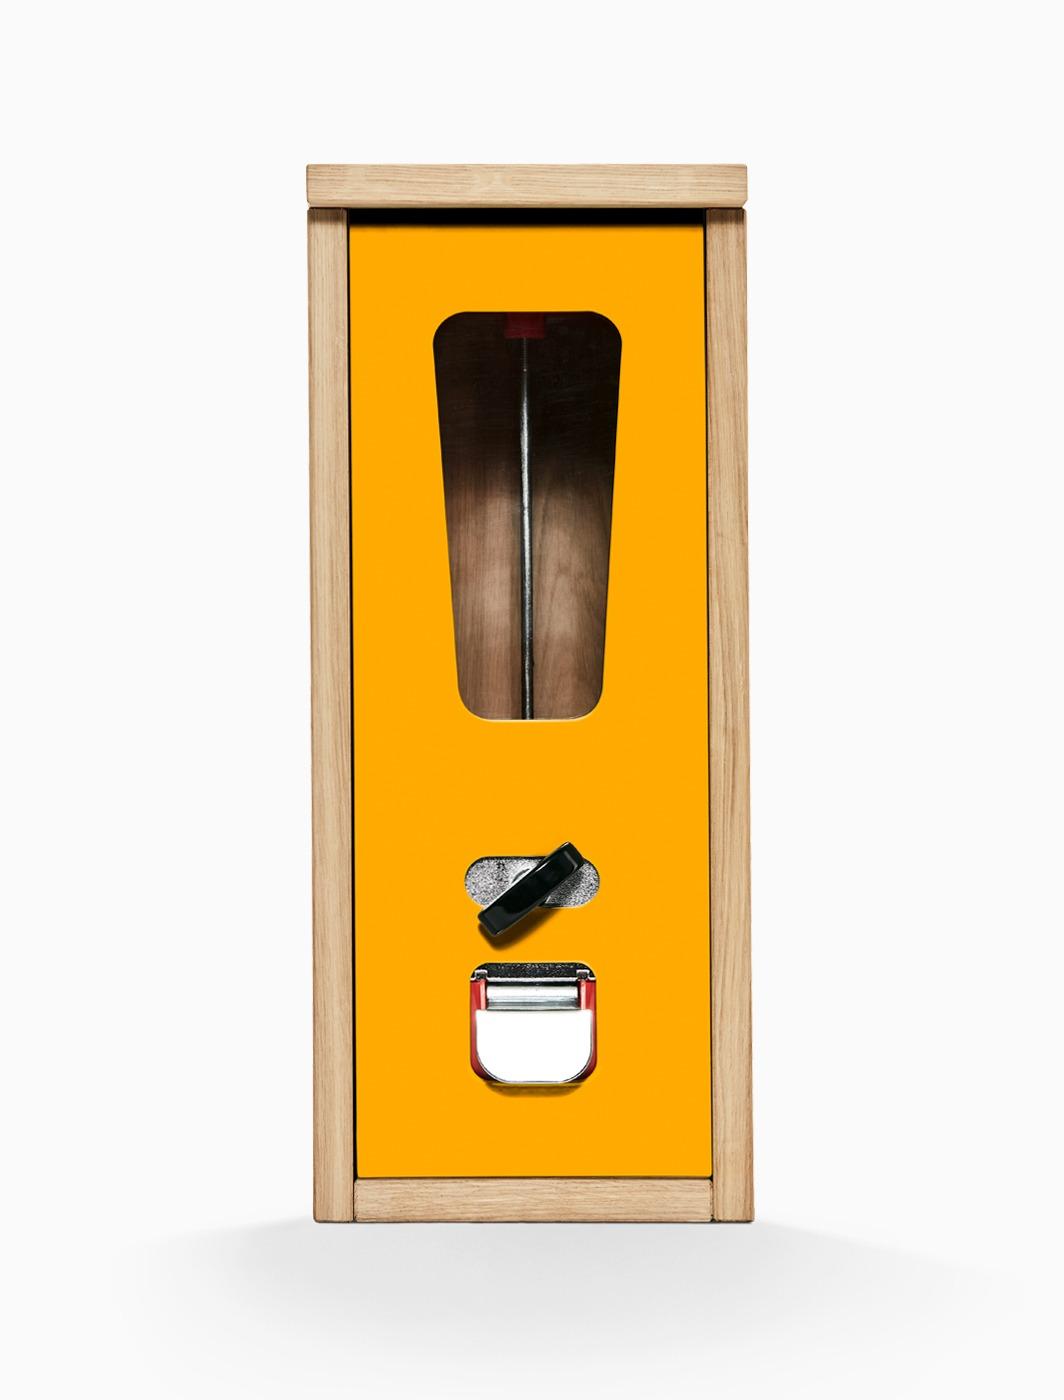 Käues-Automat mit hellem Holzkorpus und orangefarbener Frontplatte